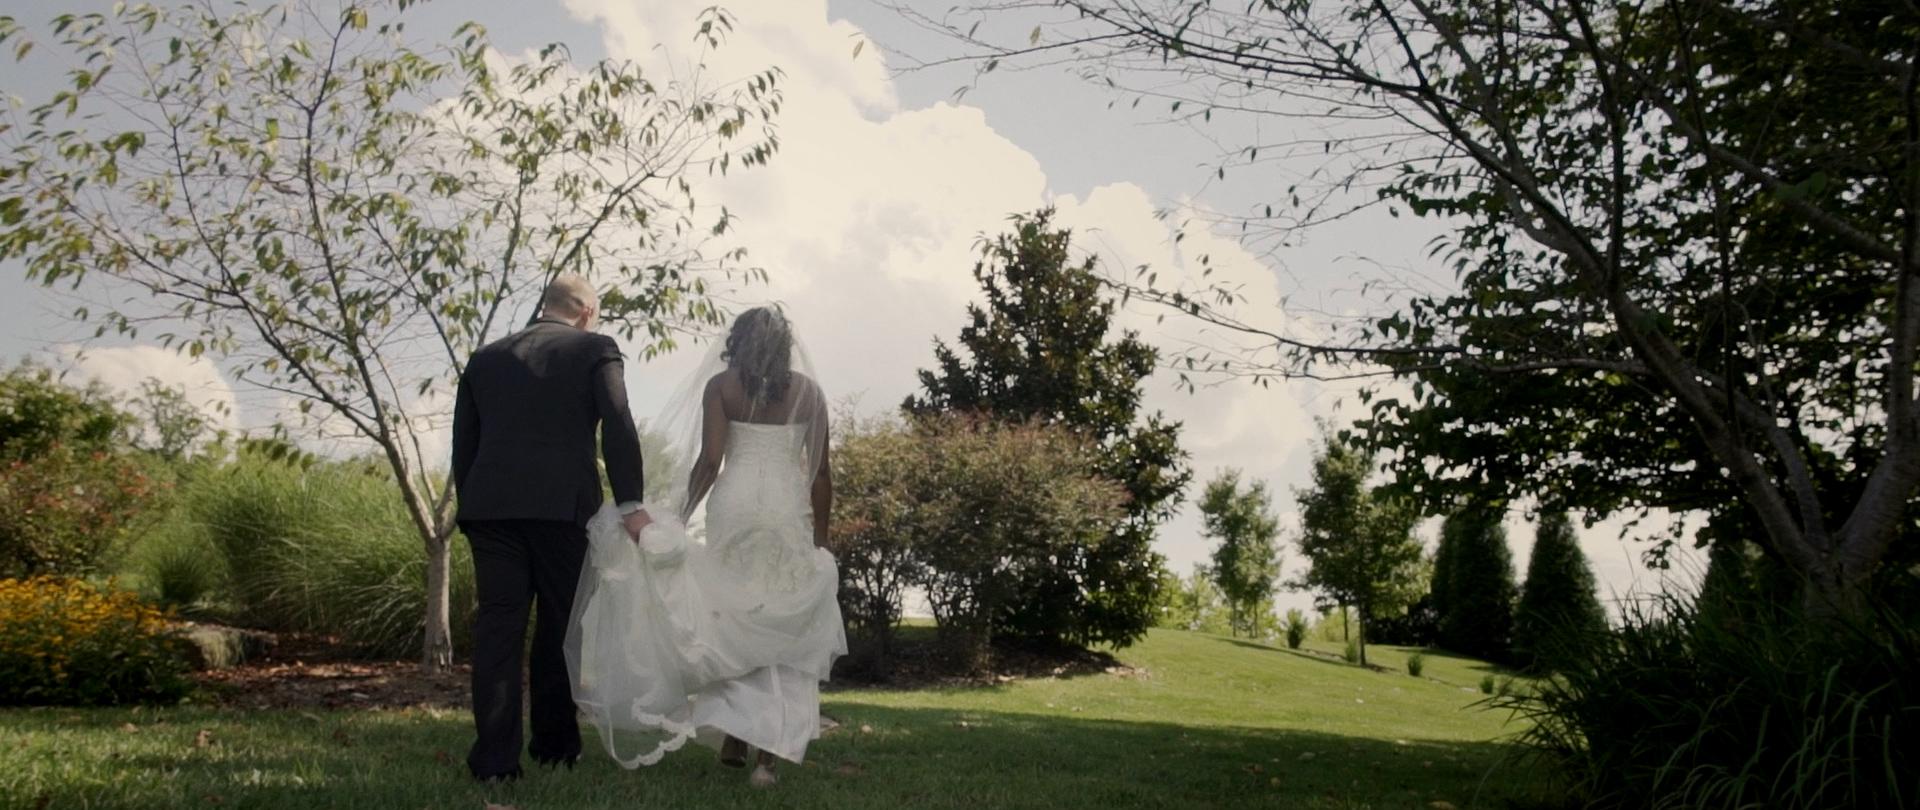 Tola_Brendan_Wedding_Film_Wedding_Video_Charlotte_NC.jpg